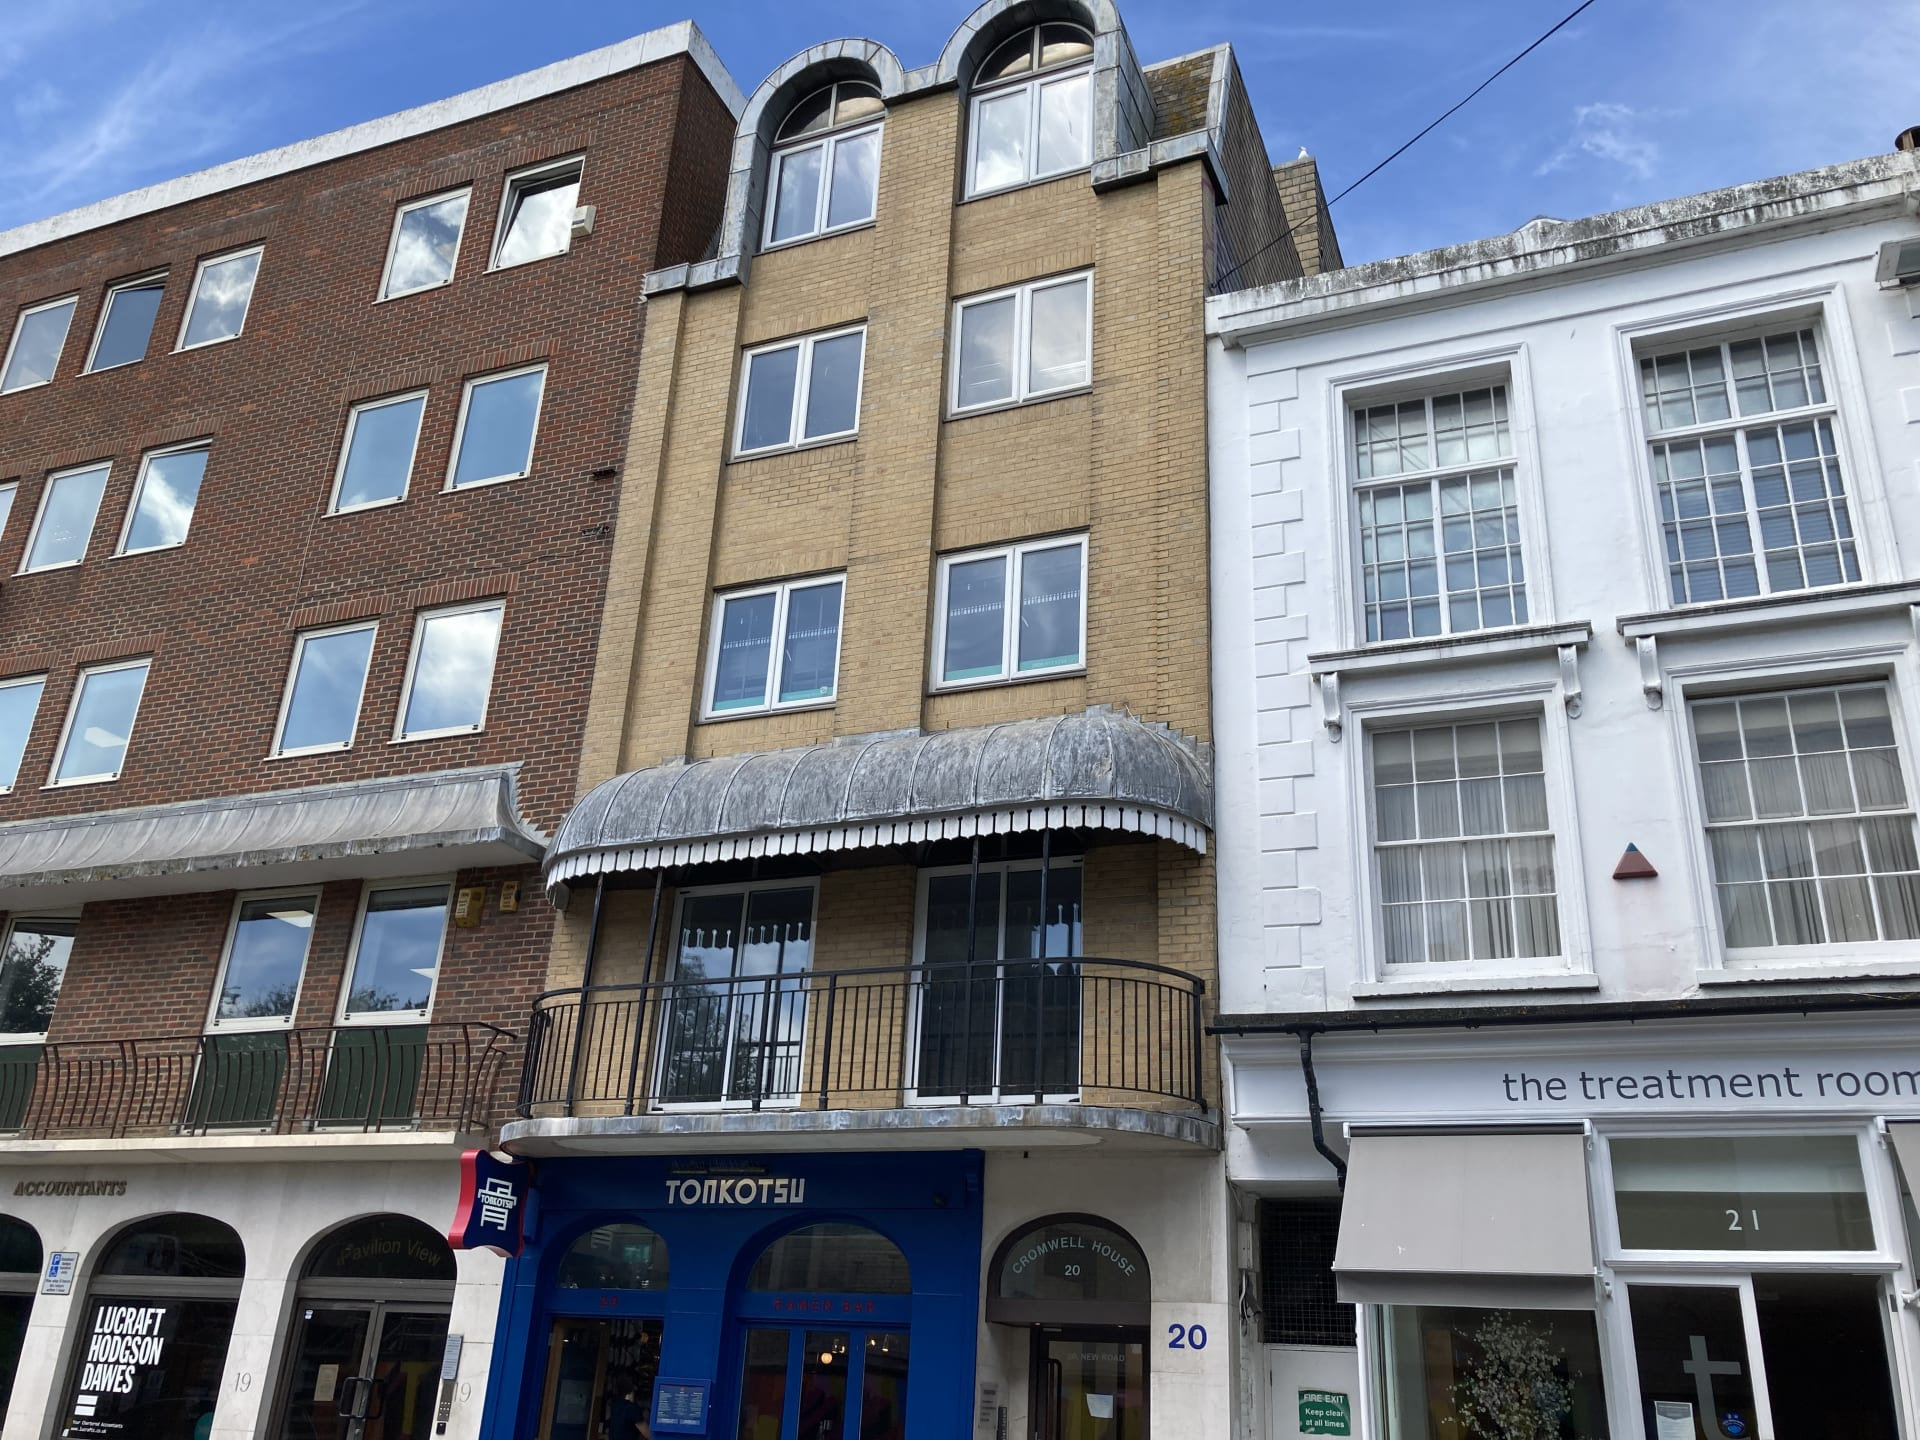 20 New Road Brighton image.